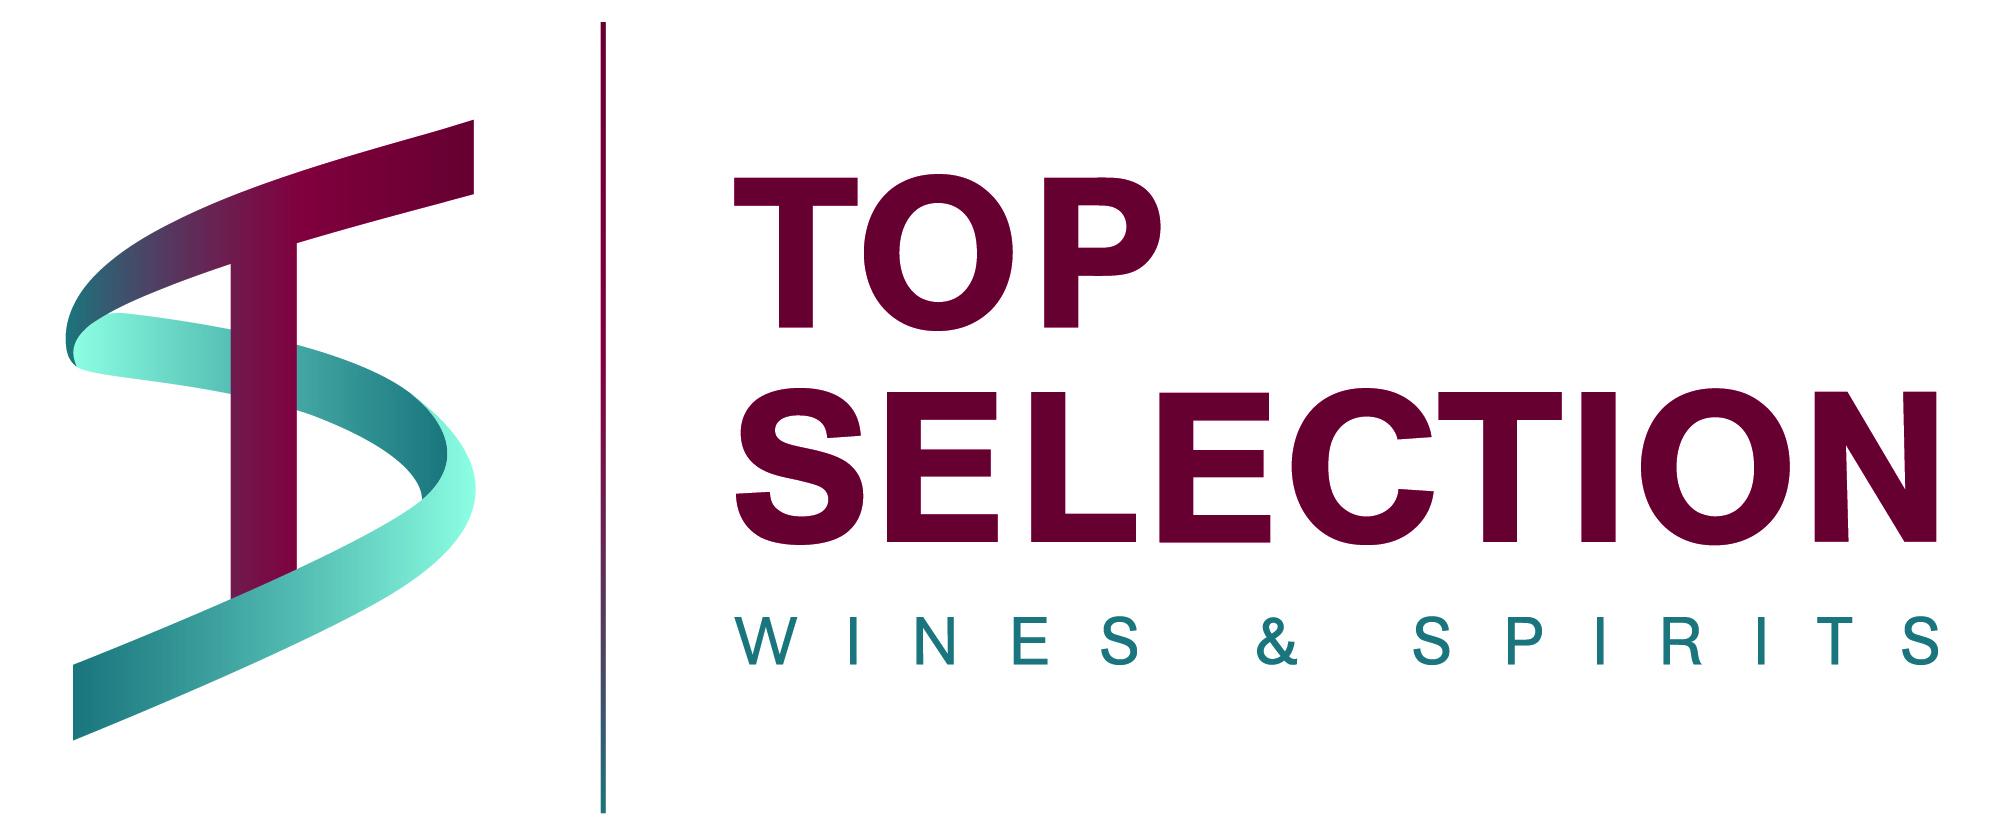 Top Selection Ltd